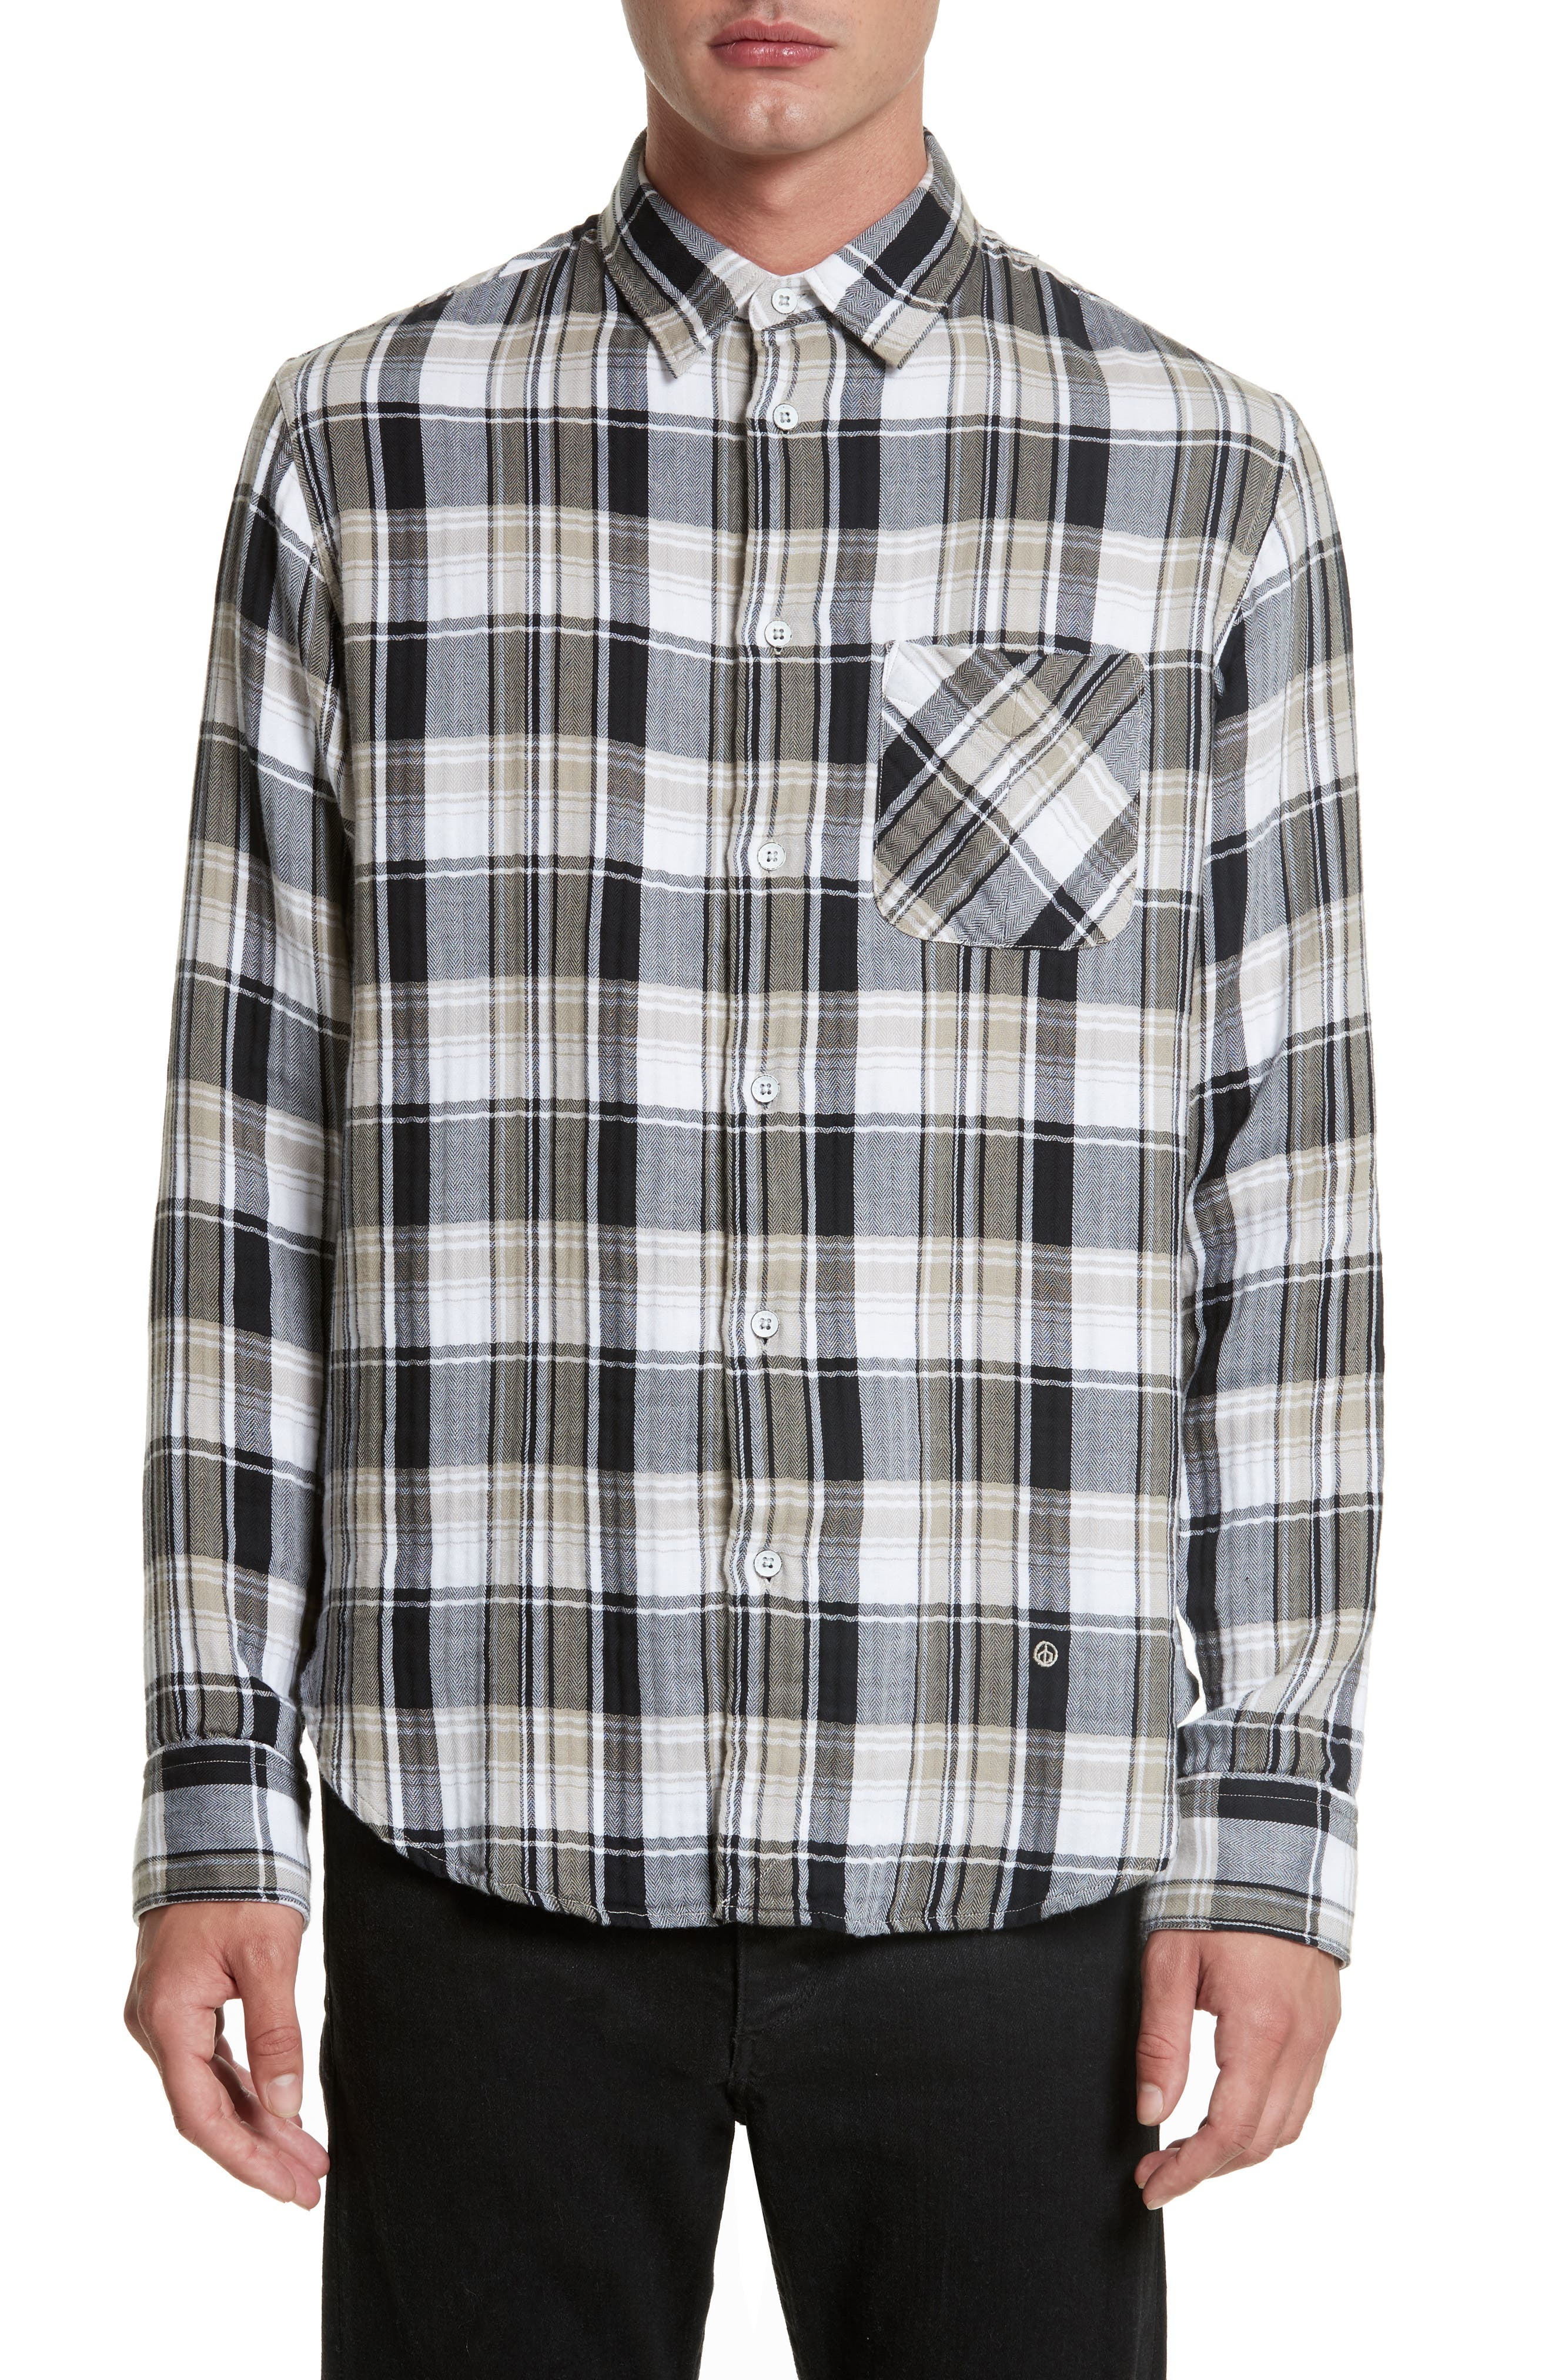 Alternate Image 1 Selected - rag & bone Fit 3 Beach Plaid Woven Shirt